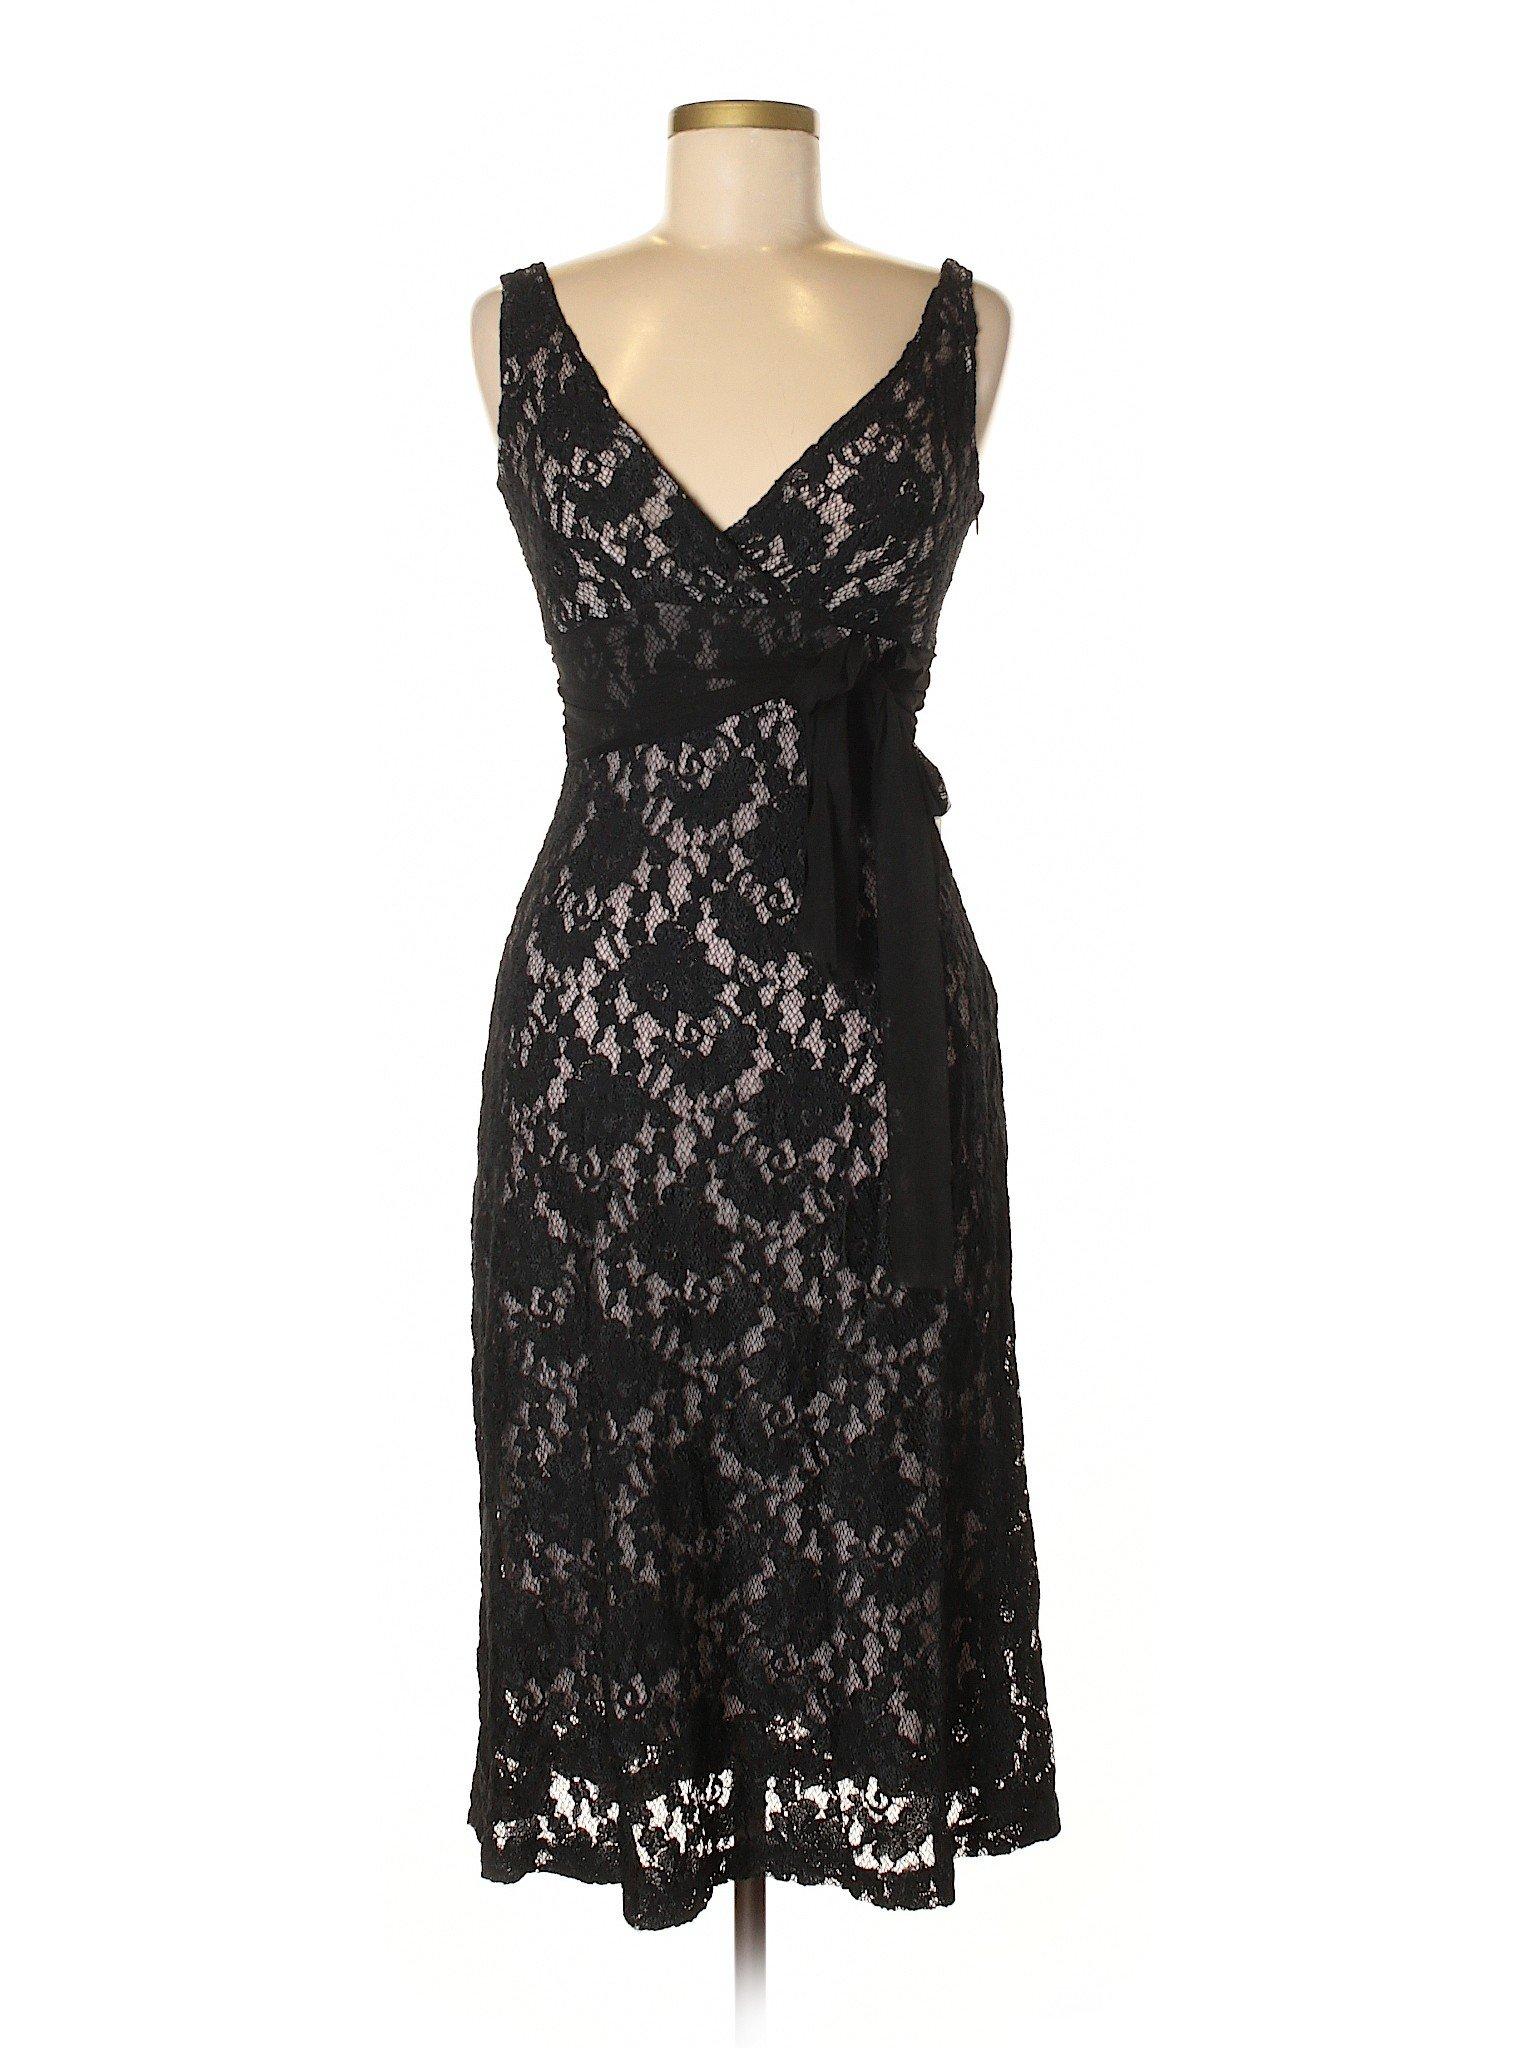 Casual Dress Selling Boston Selling Boston Proper zI6xUqSn